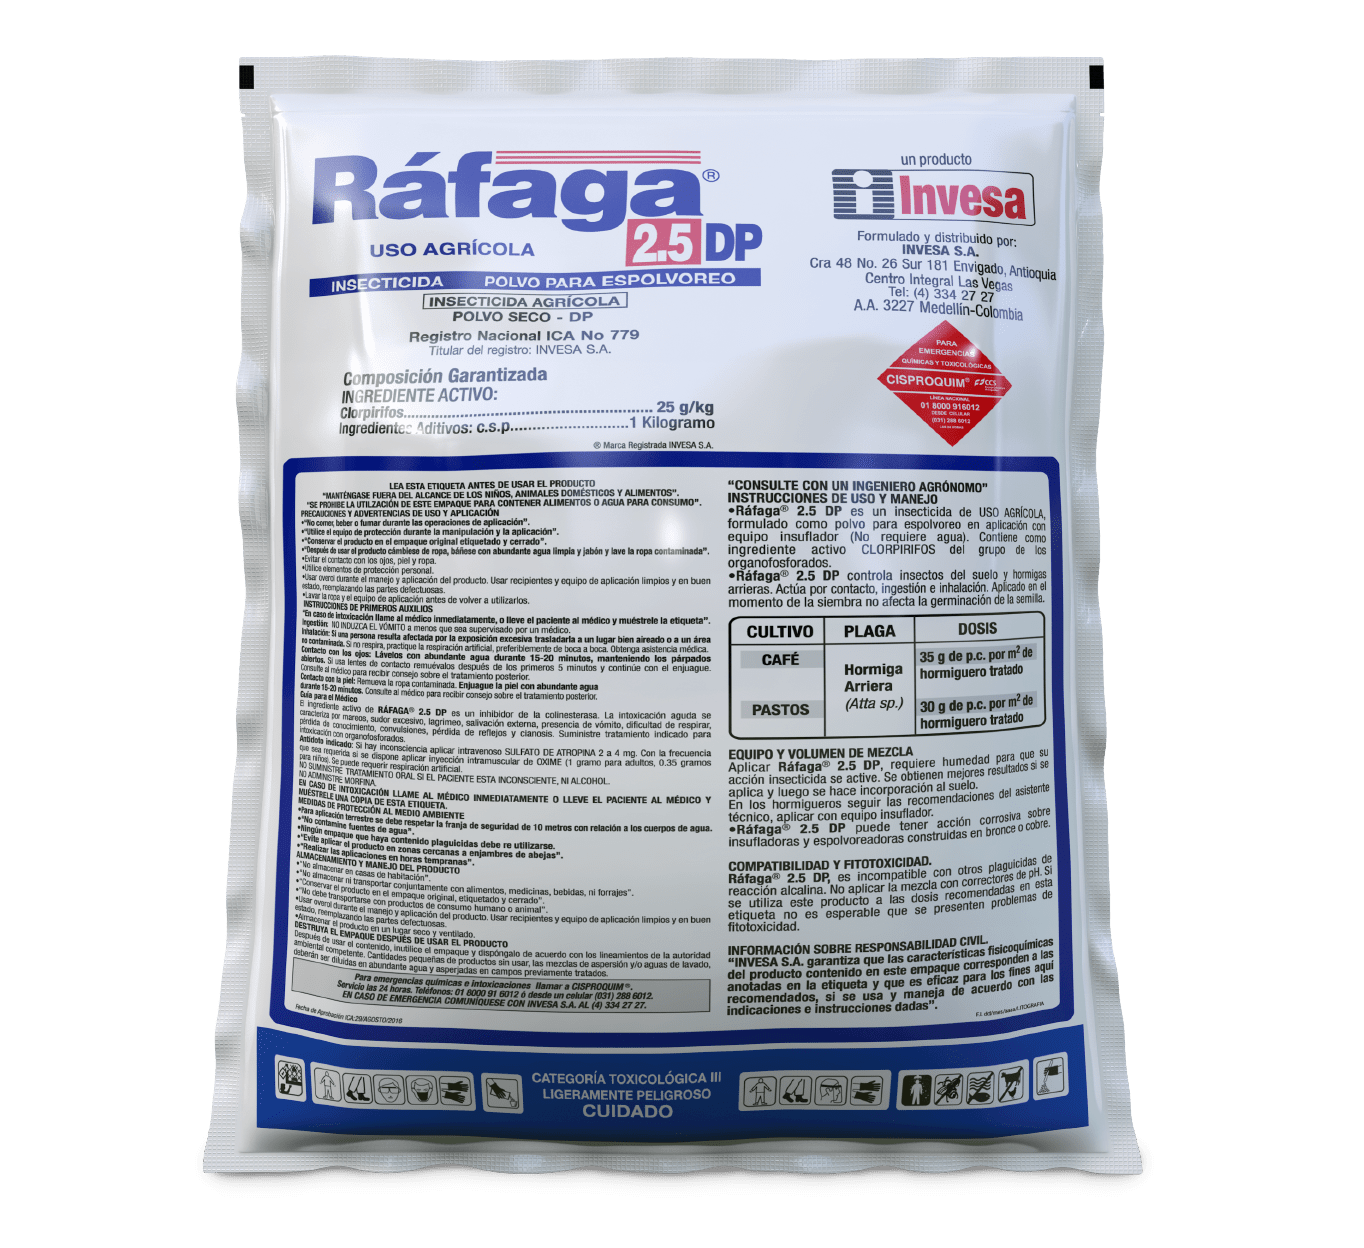 Insecticida rafaga 2.5 invesa 25 kg